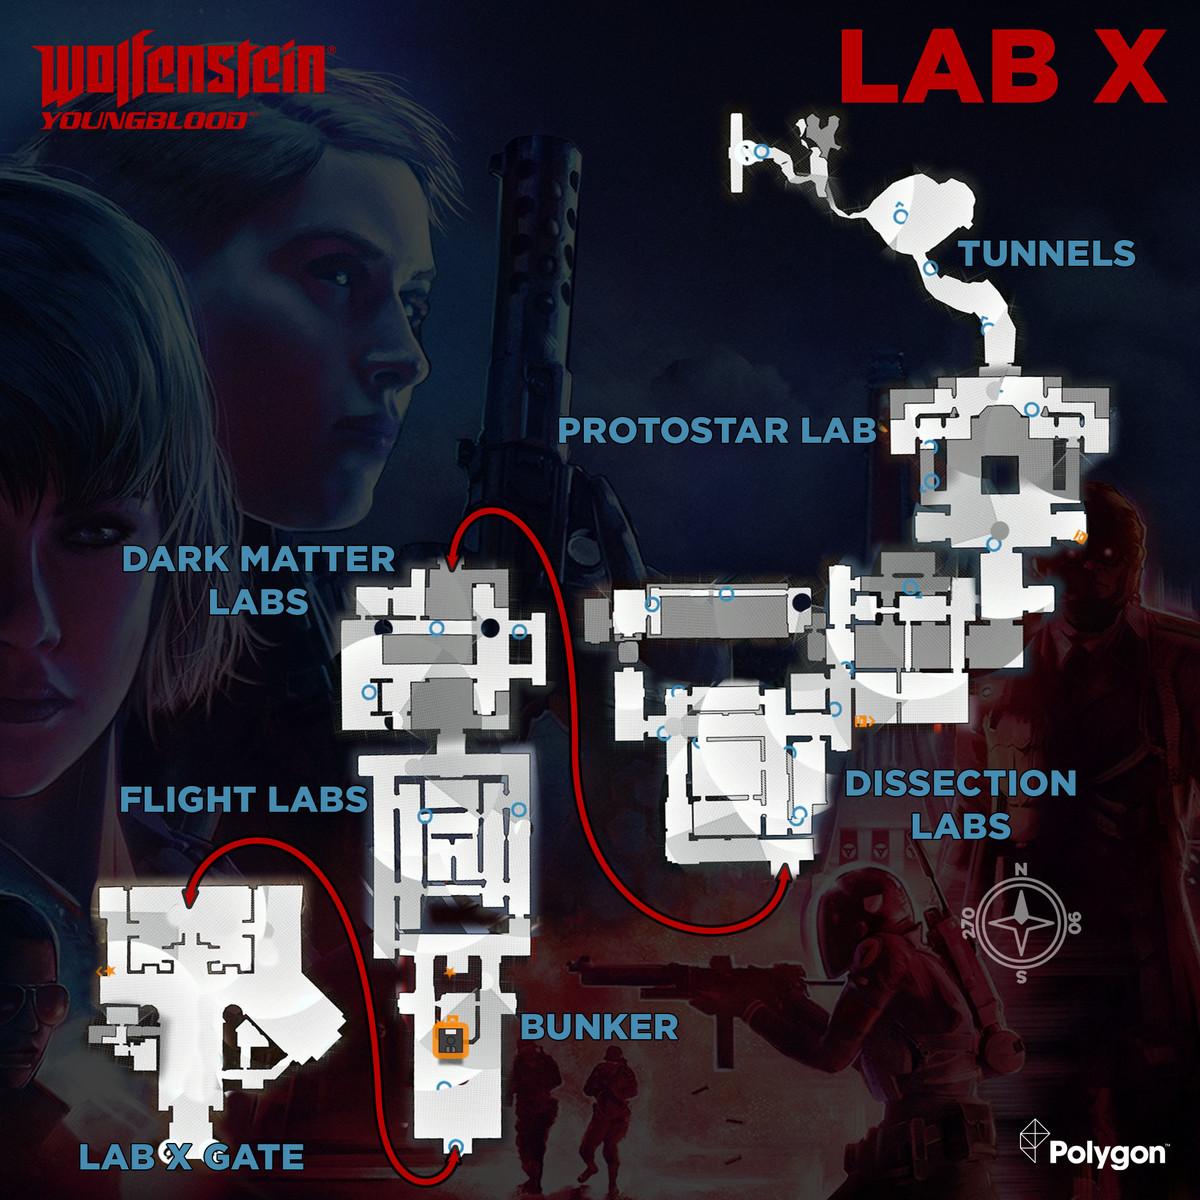 Wolfenstein: Youngblood Lab X floppy disk collectibles map